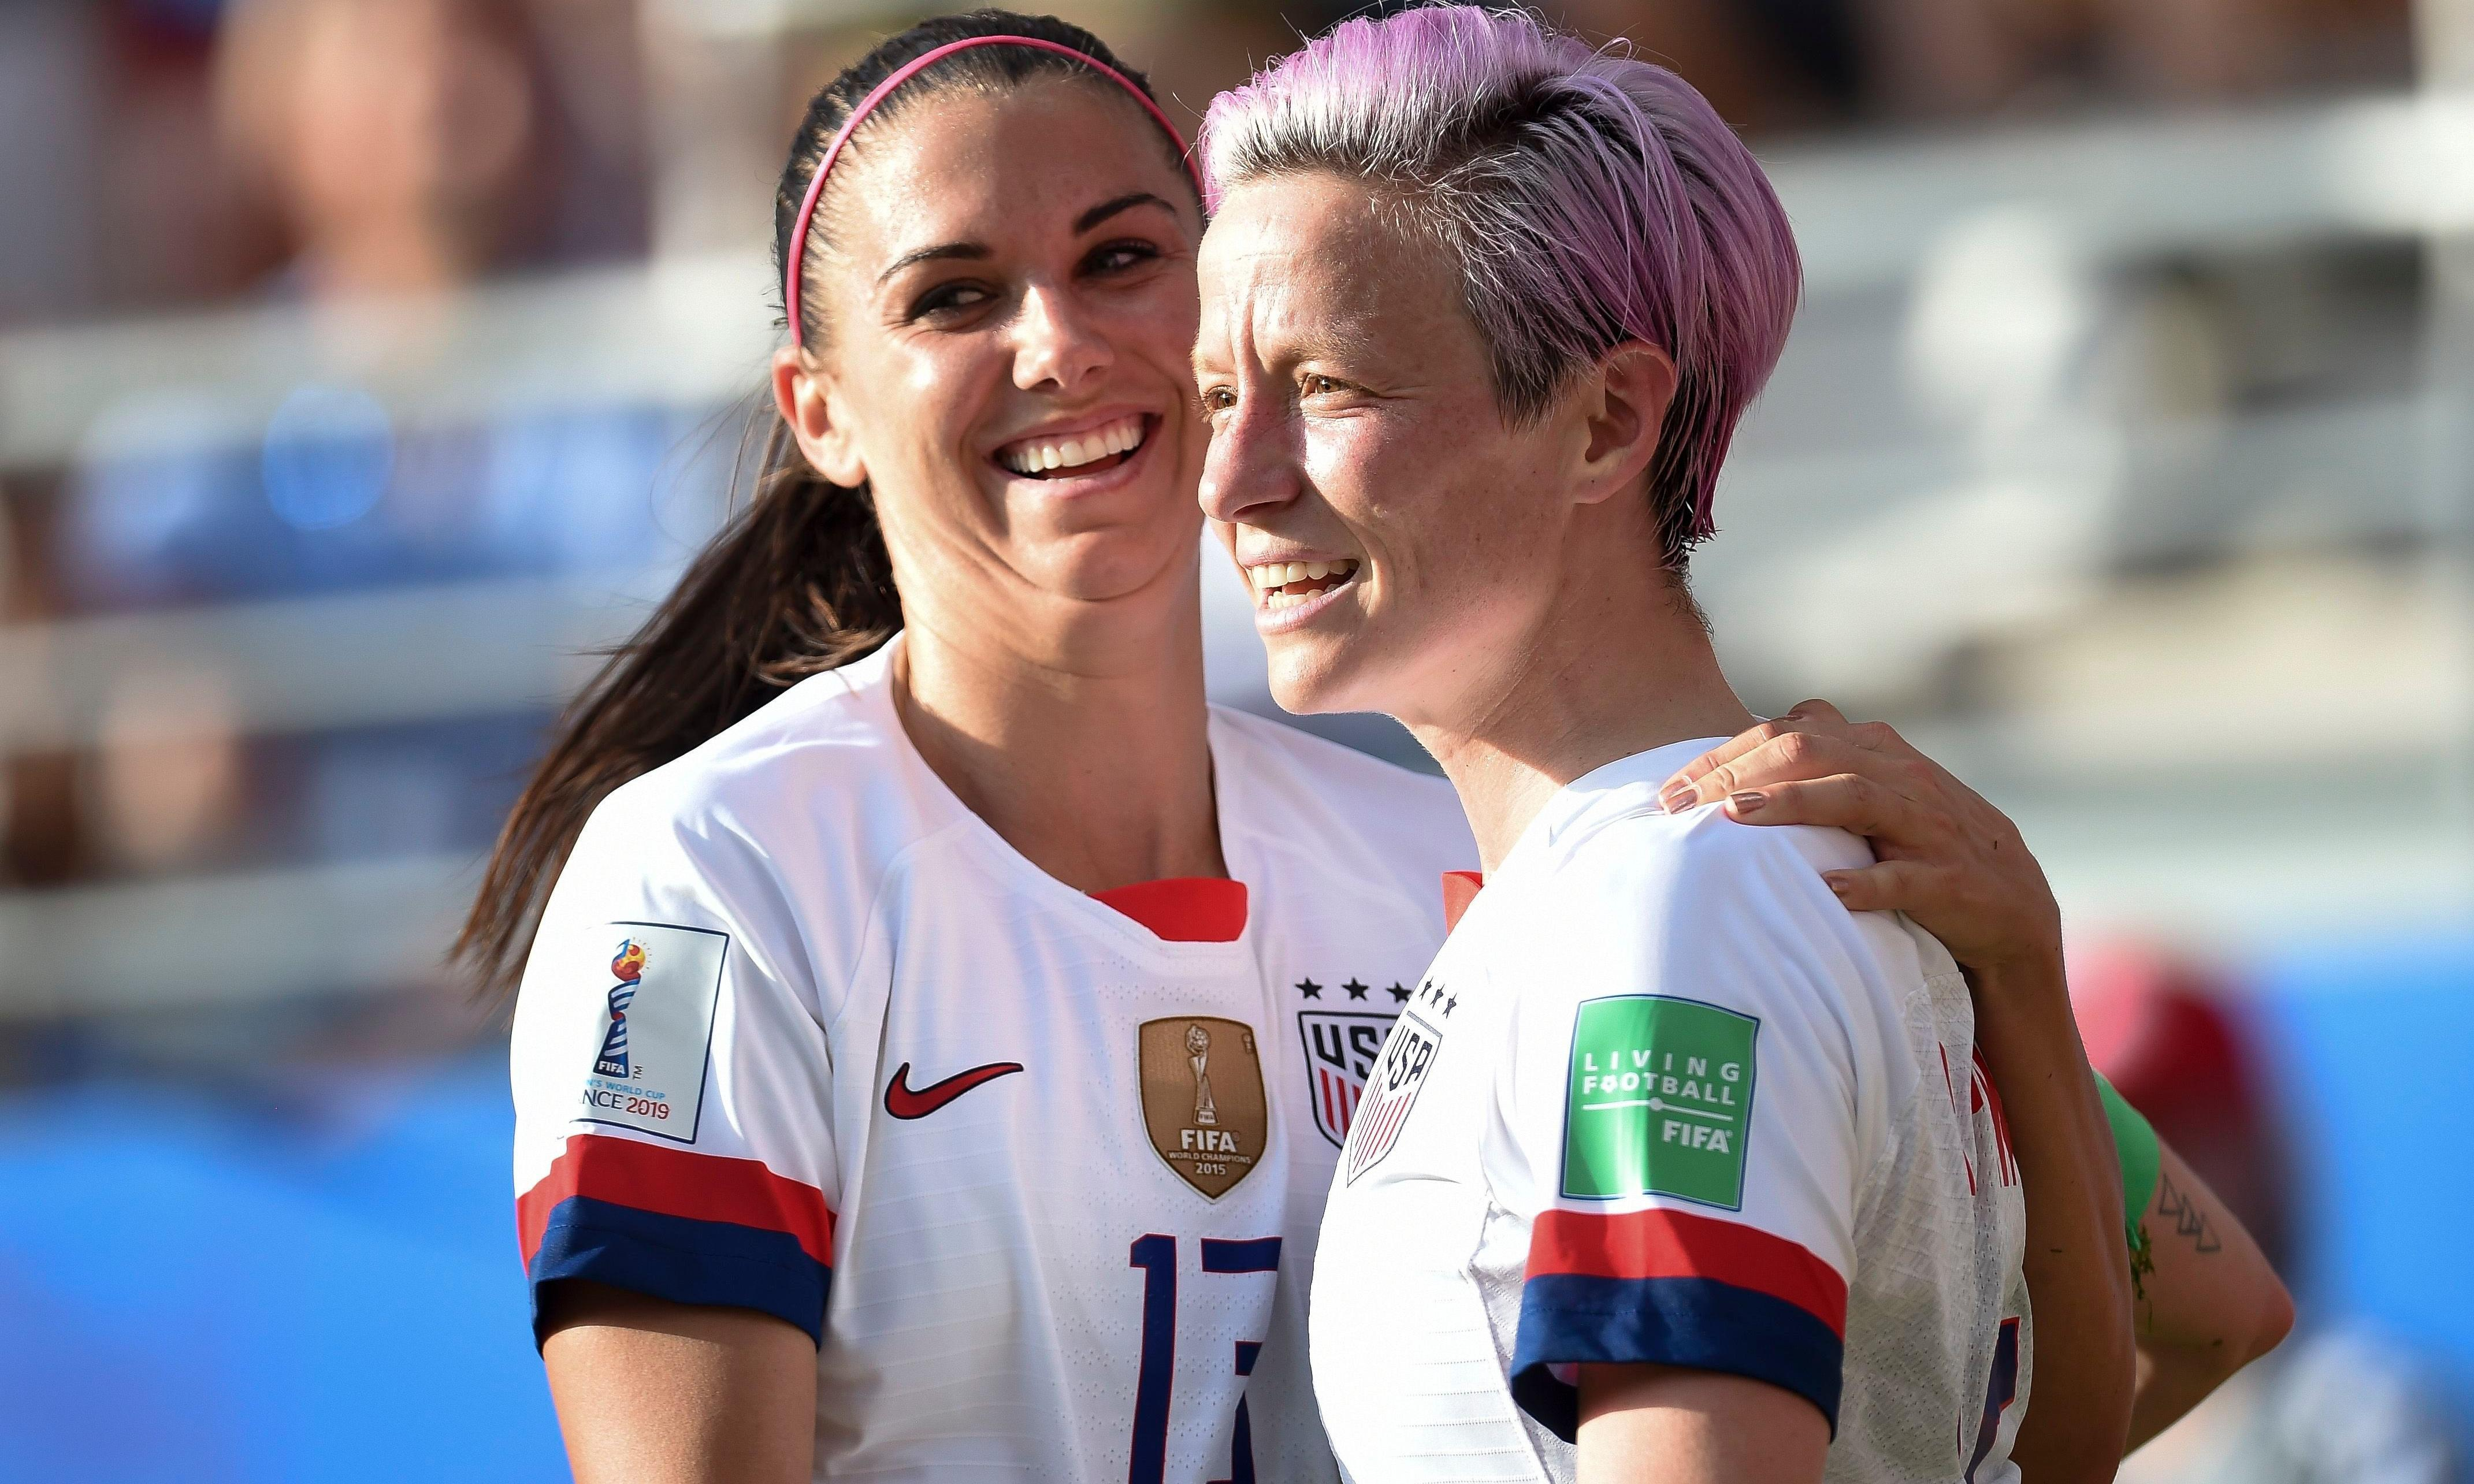 Donald Trump warns Megan Rapinoe not to 'disrespect' US flag at World Cup